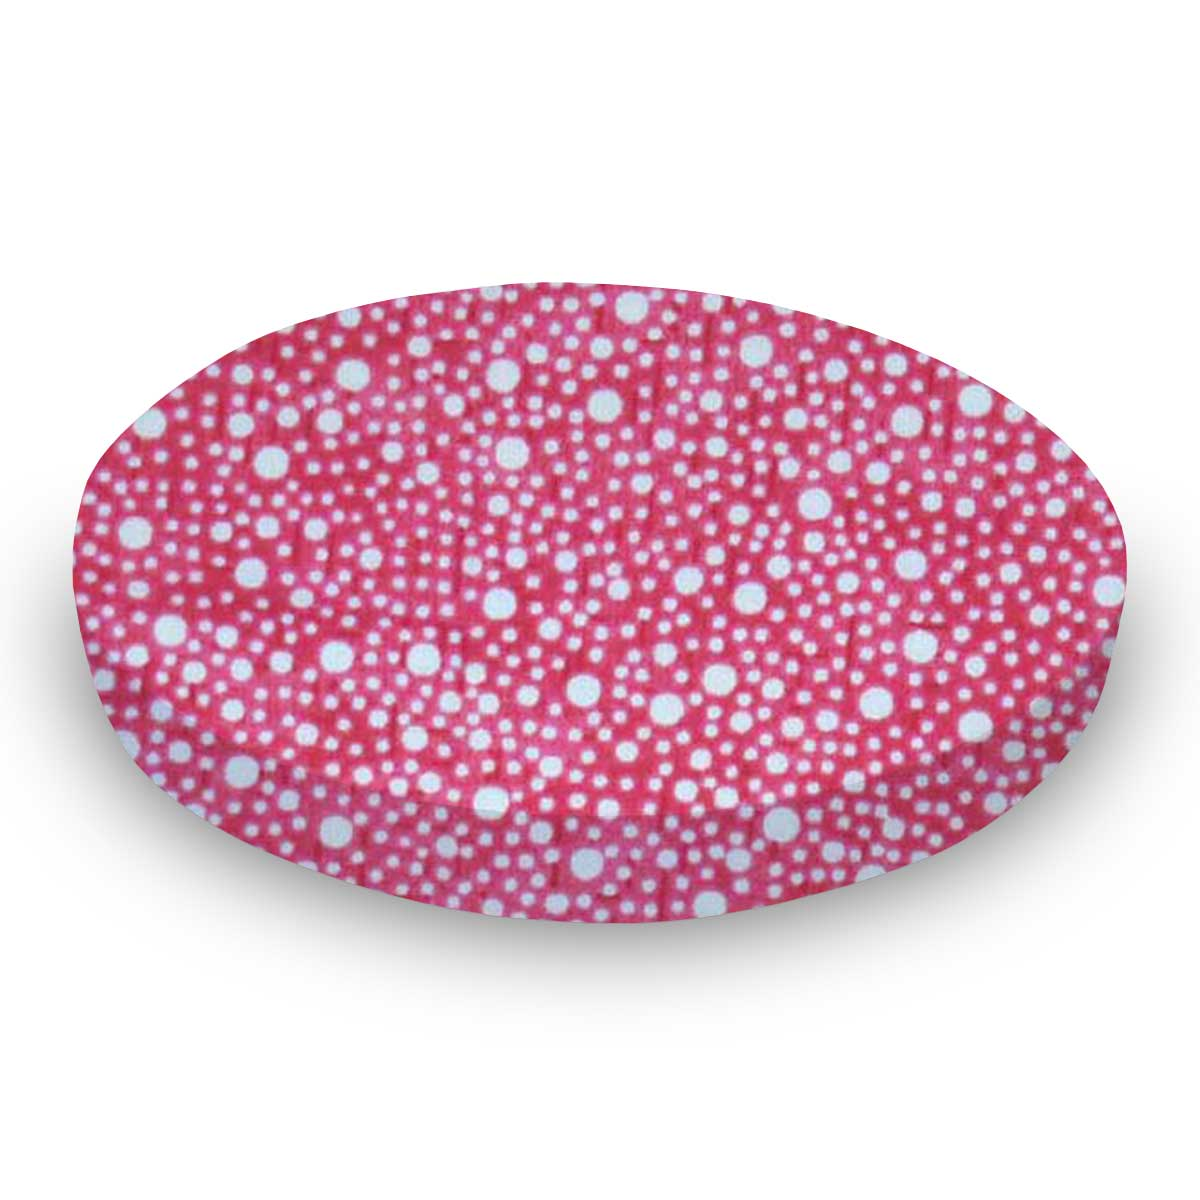 SheetWorld Fitted Oval Crib Sheet (Stokke Sleepi) - Confetti Dots Hot Pink